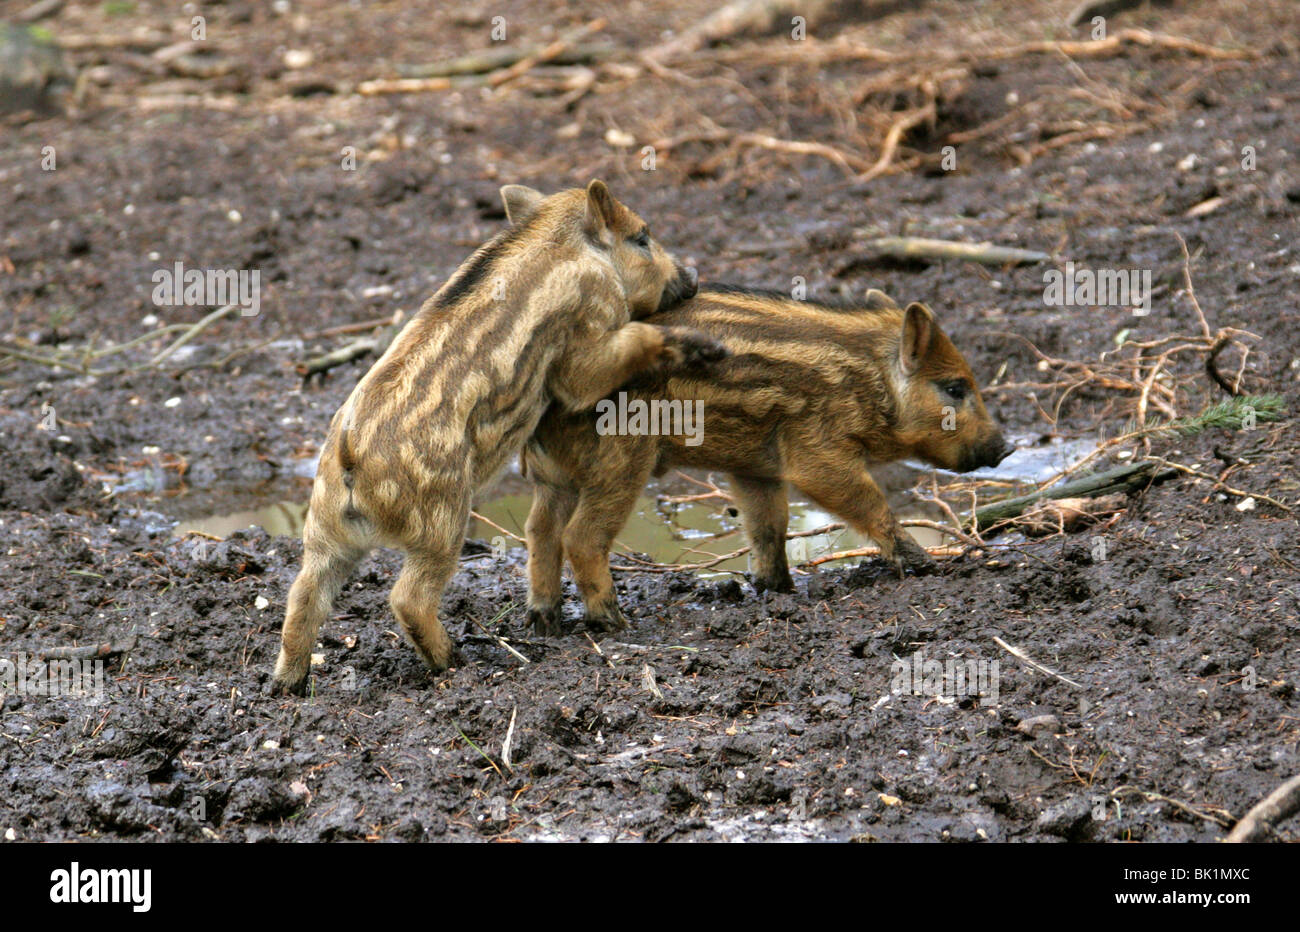 European Wild Boar Piglets, Sus scrofa scrofa, Suidae, Playing in the Mud - Stock Image